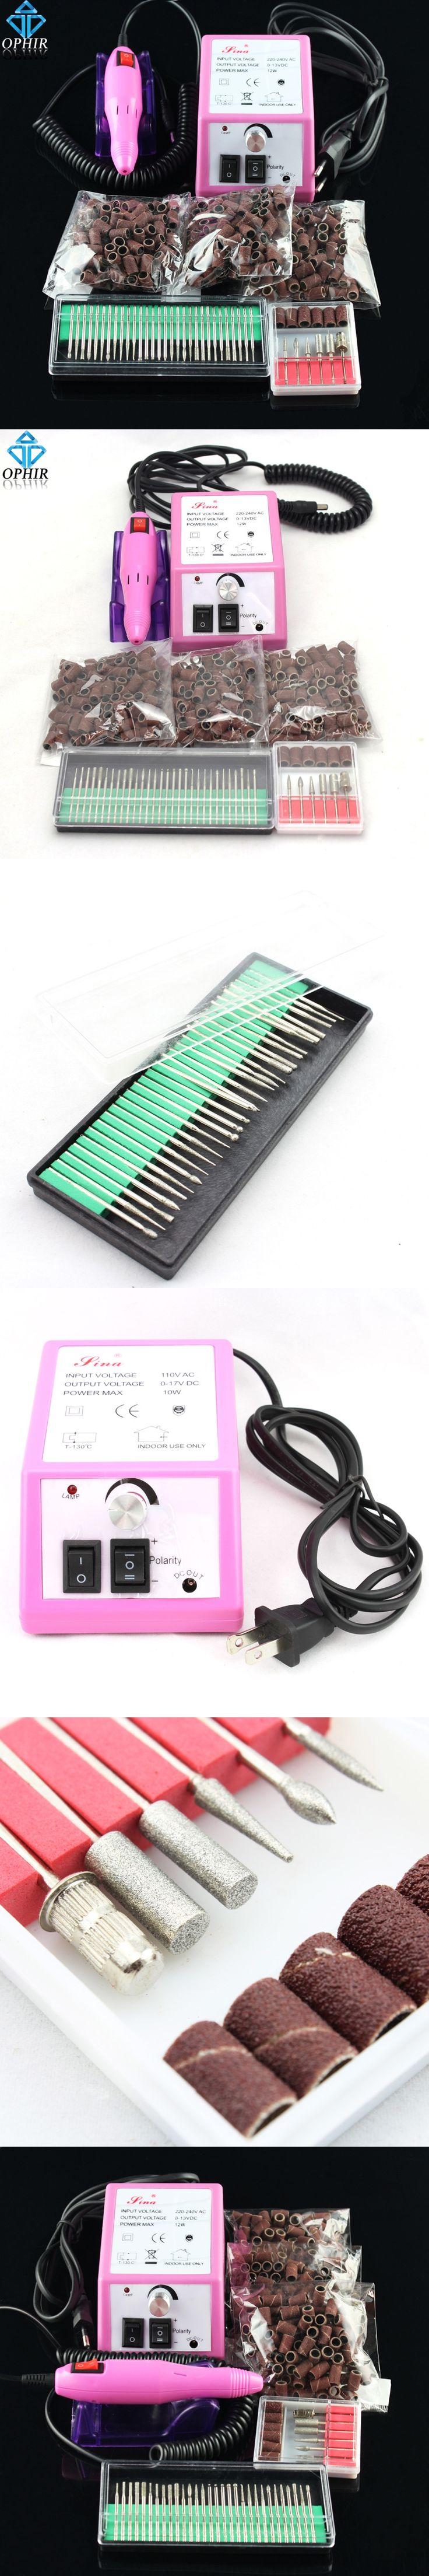 OPHIR Mini Electric Nail Drill Machine Nail Tool Nail Art Equipment Manicure Pedicure Acrylics Nail Drill Pen Kit_KD139+